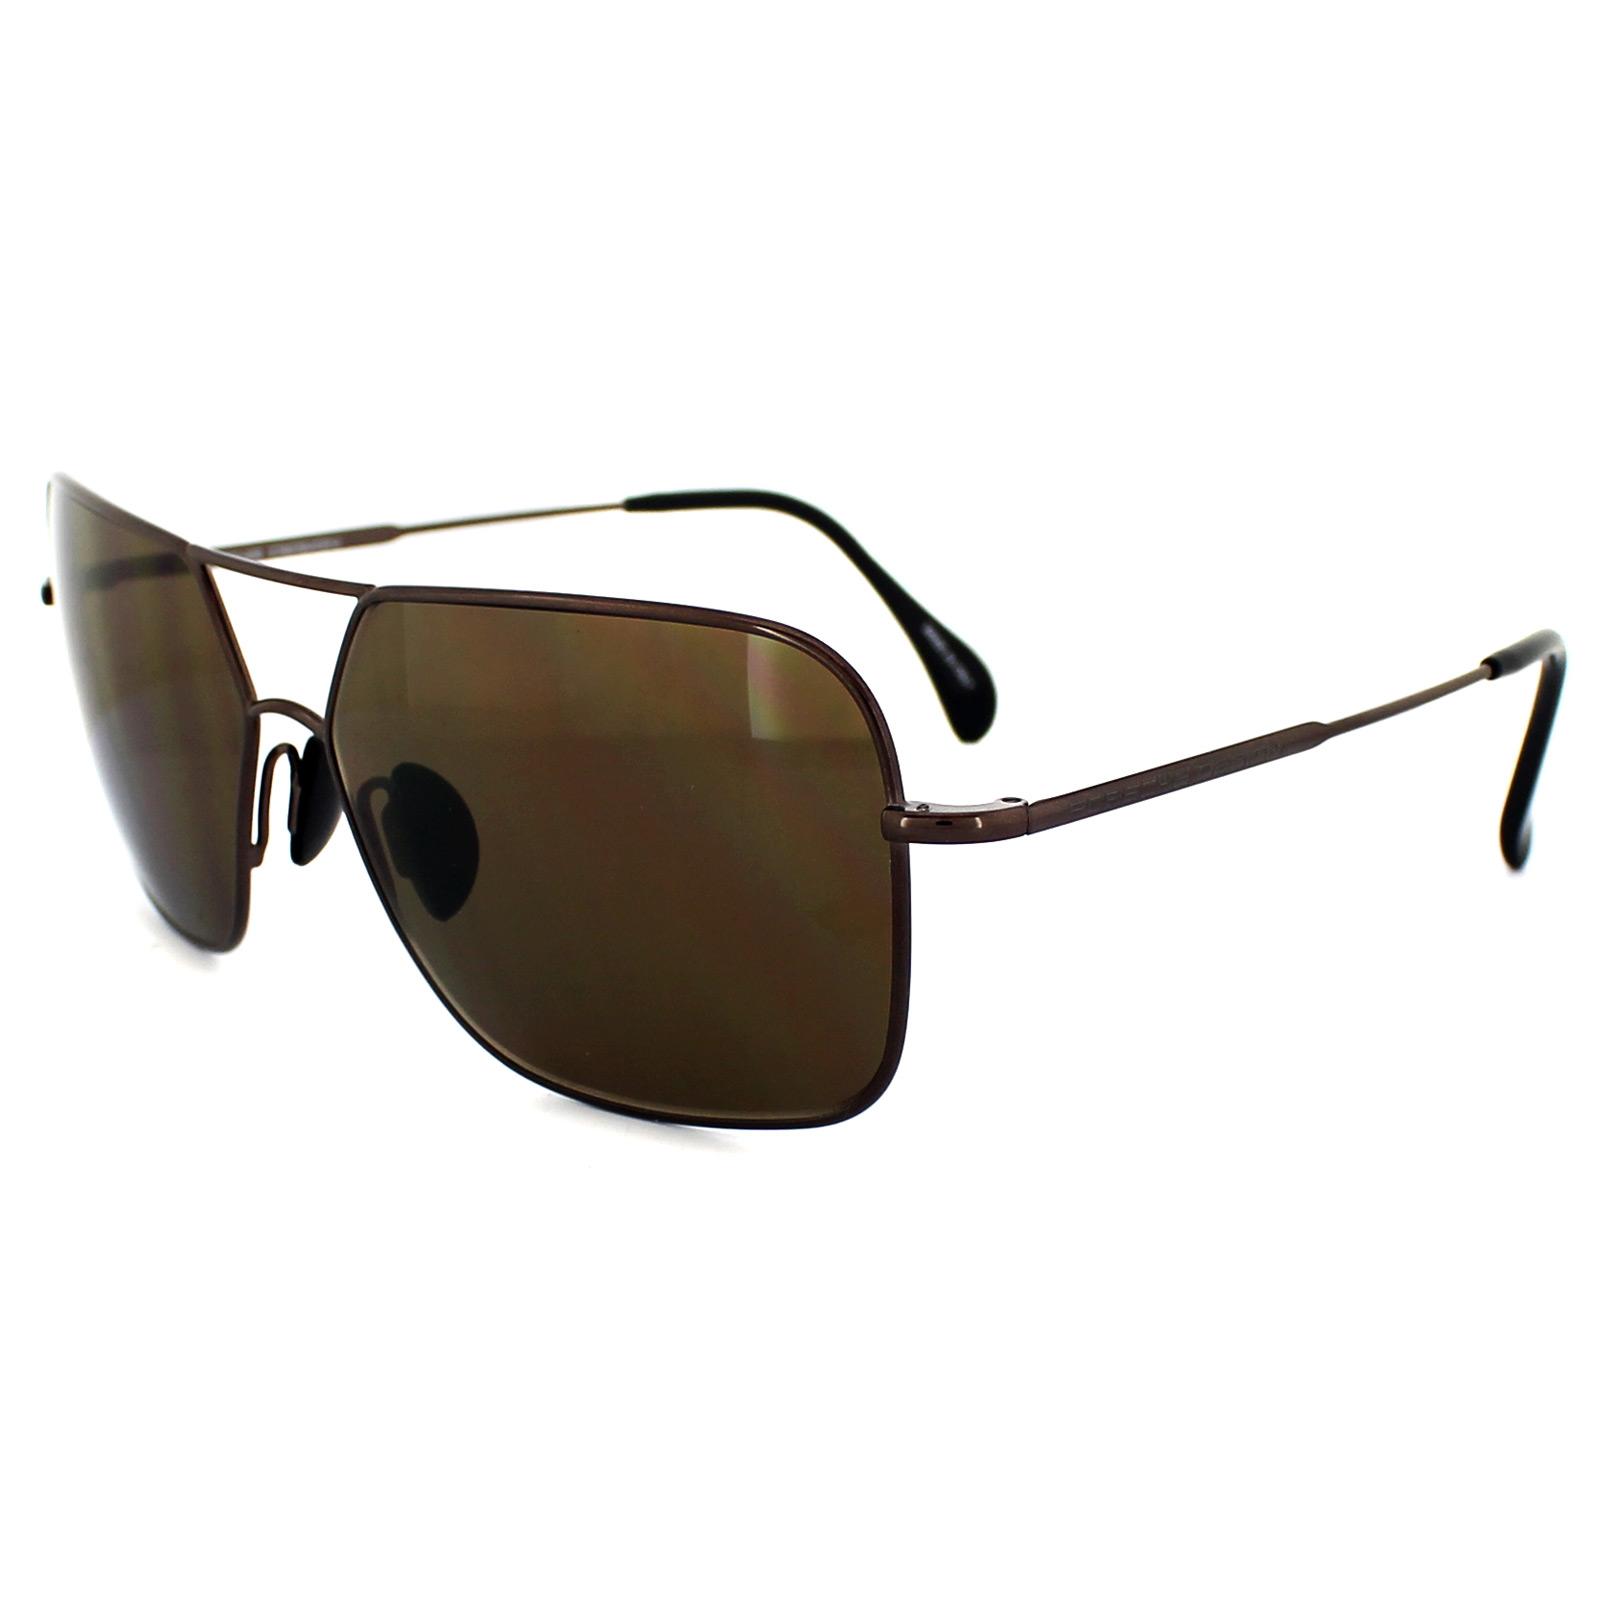 porsche design lunettes de soleil p8512 c bronze brun ebay. Black Bedroom Furniture Sets. Home Design Ideas